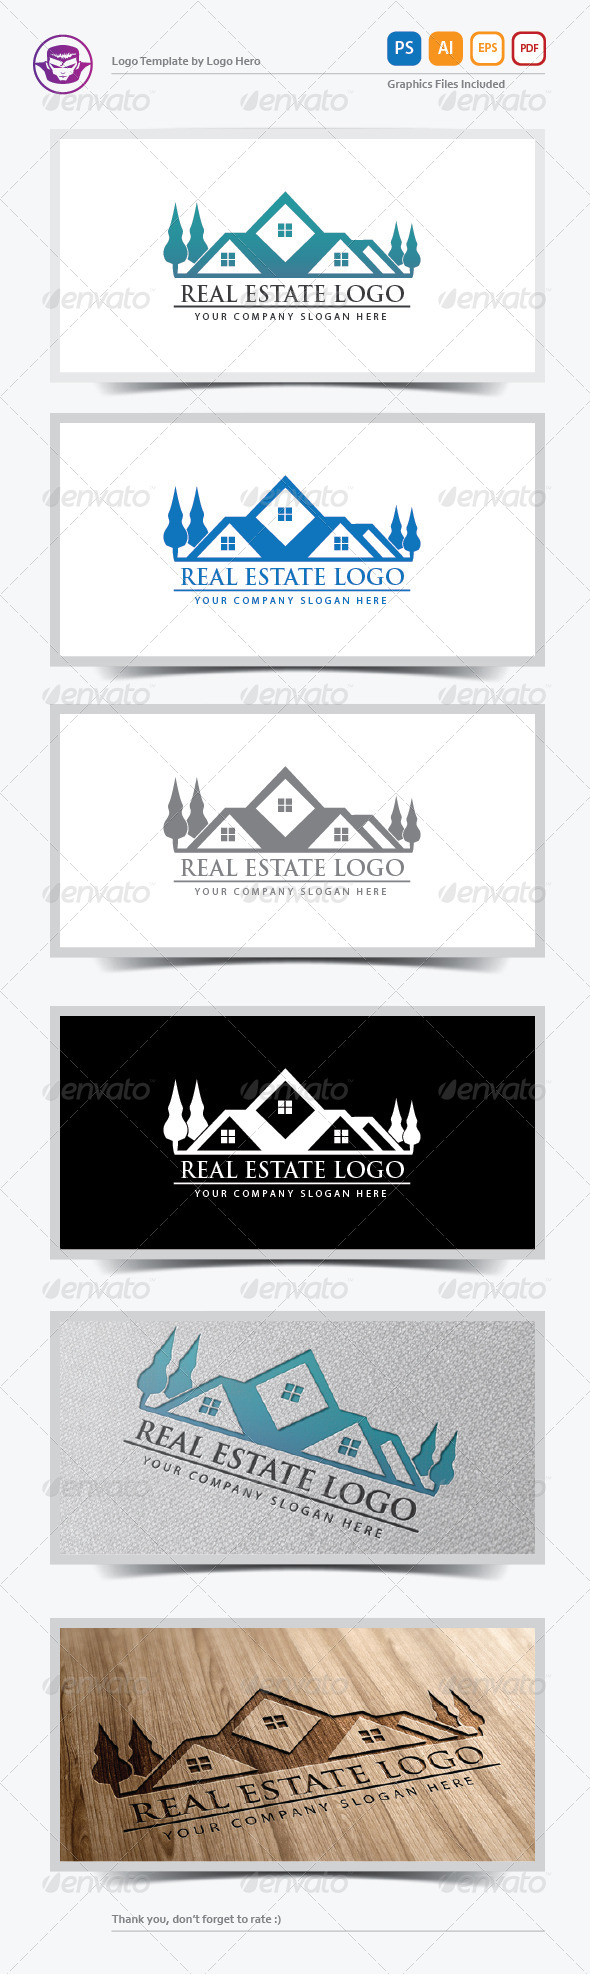 Real Estate Logo Template V.2